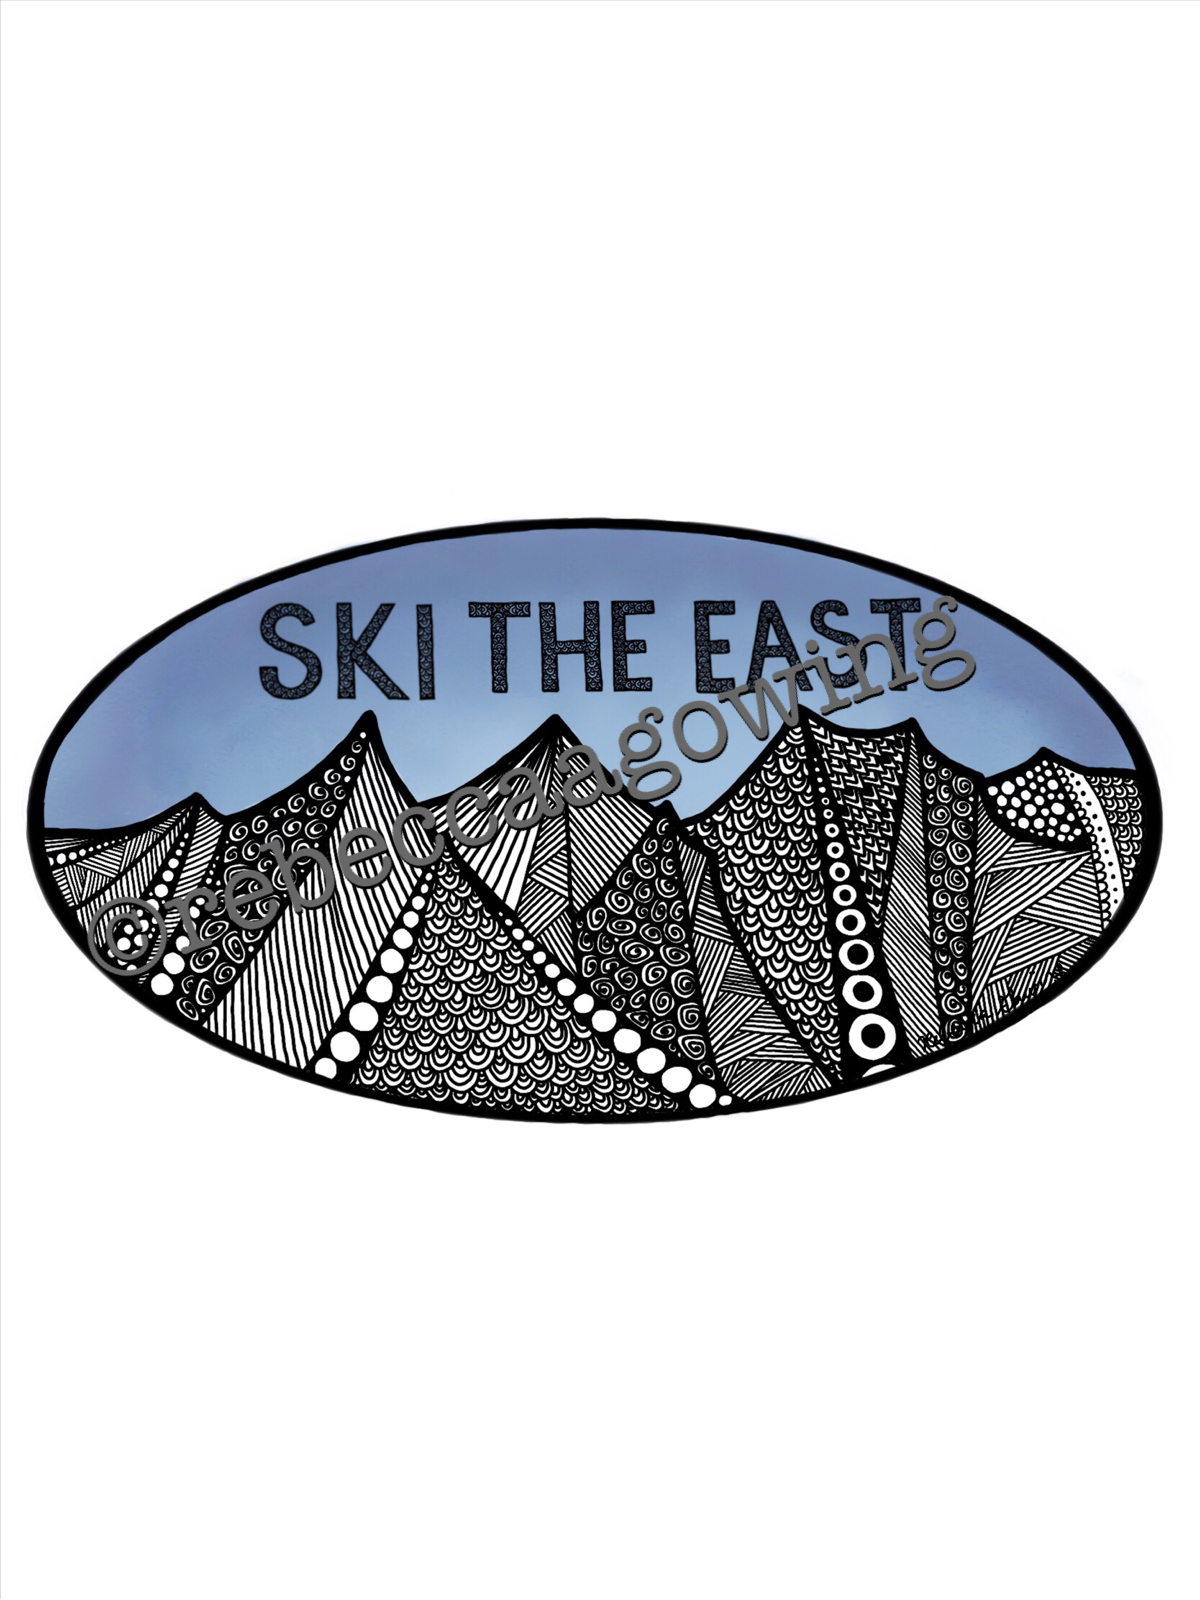 My Ski The East Sticker Design Sticker Design Car Stickers Artwork [ 1600 x 1200 Pixel ]